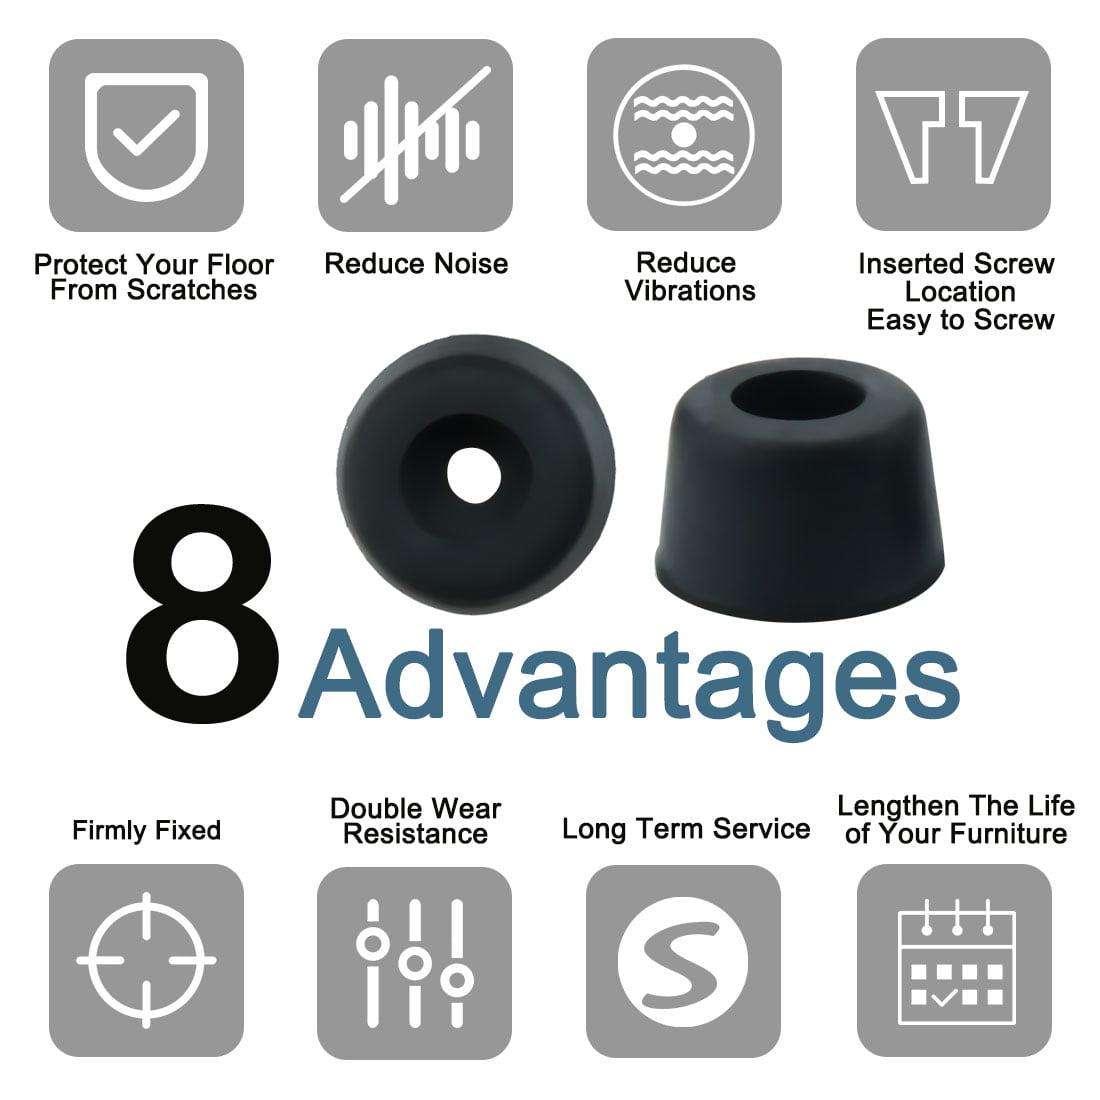 32pcs Rubber Feet Bumper Speaker Floor Protector for Desk Leg Pad, D14x12xH9mm - image 5 of 7